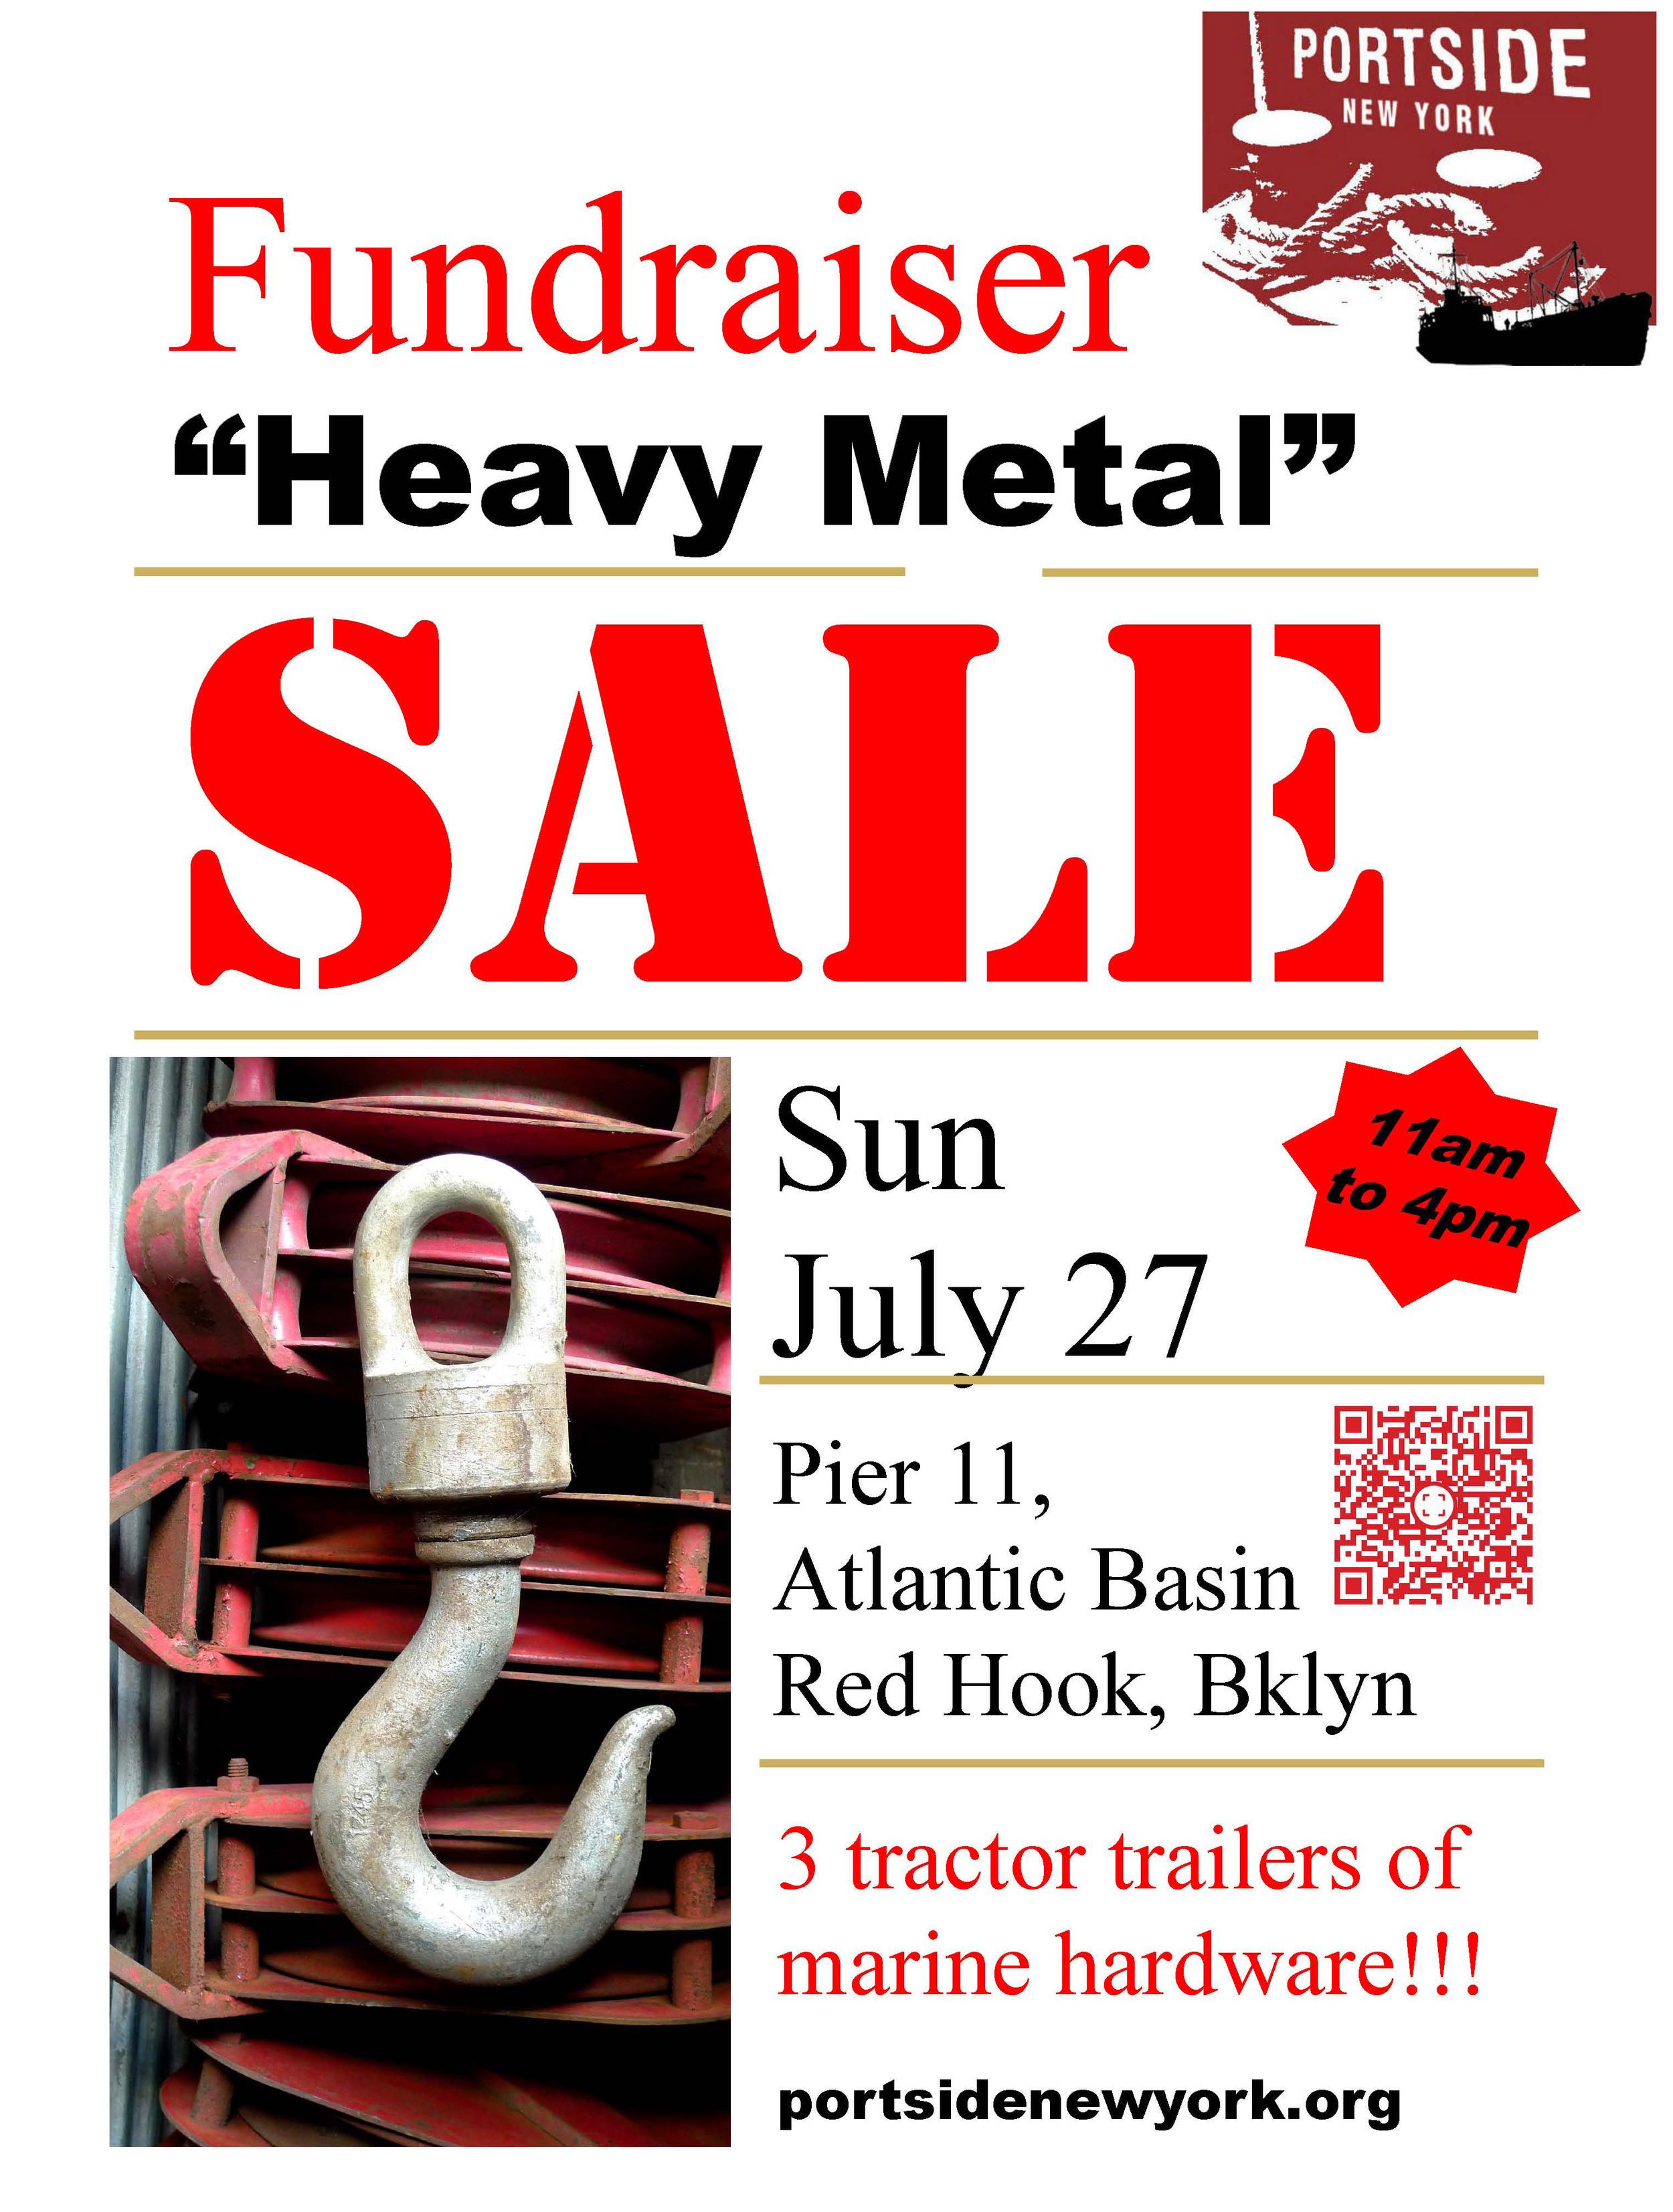 2014 PortSide Heavy Metal wayfinding1.jpg